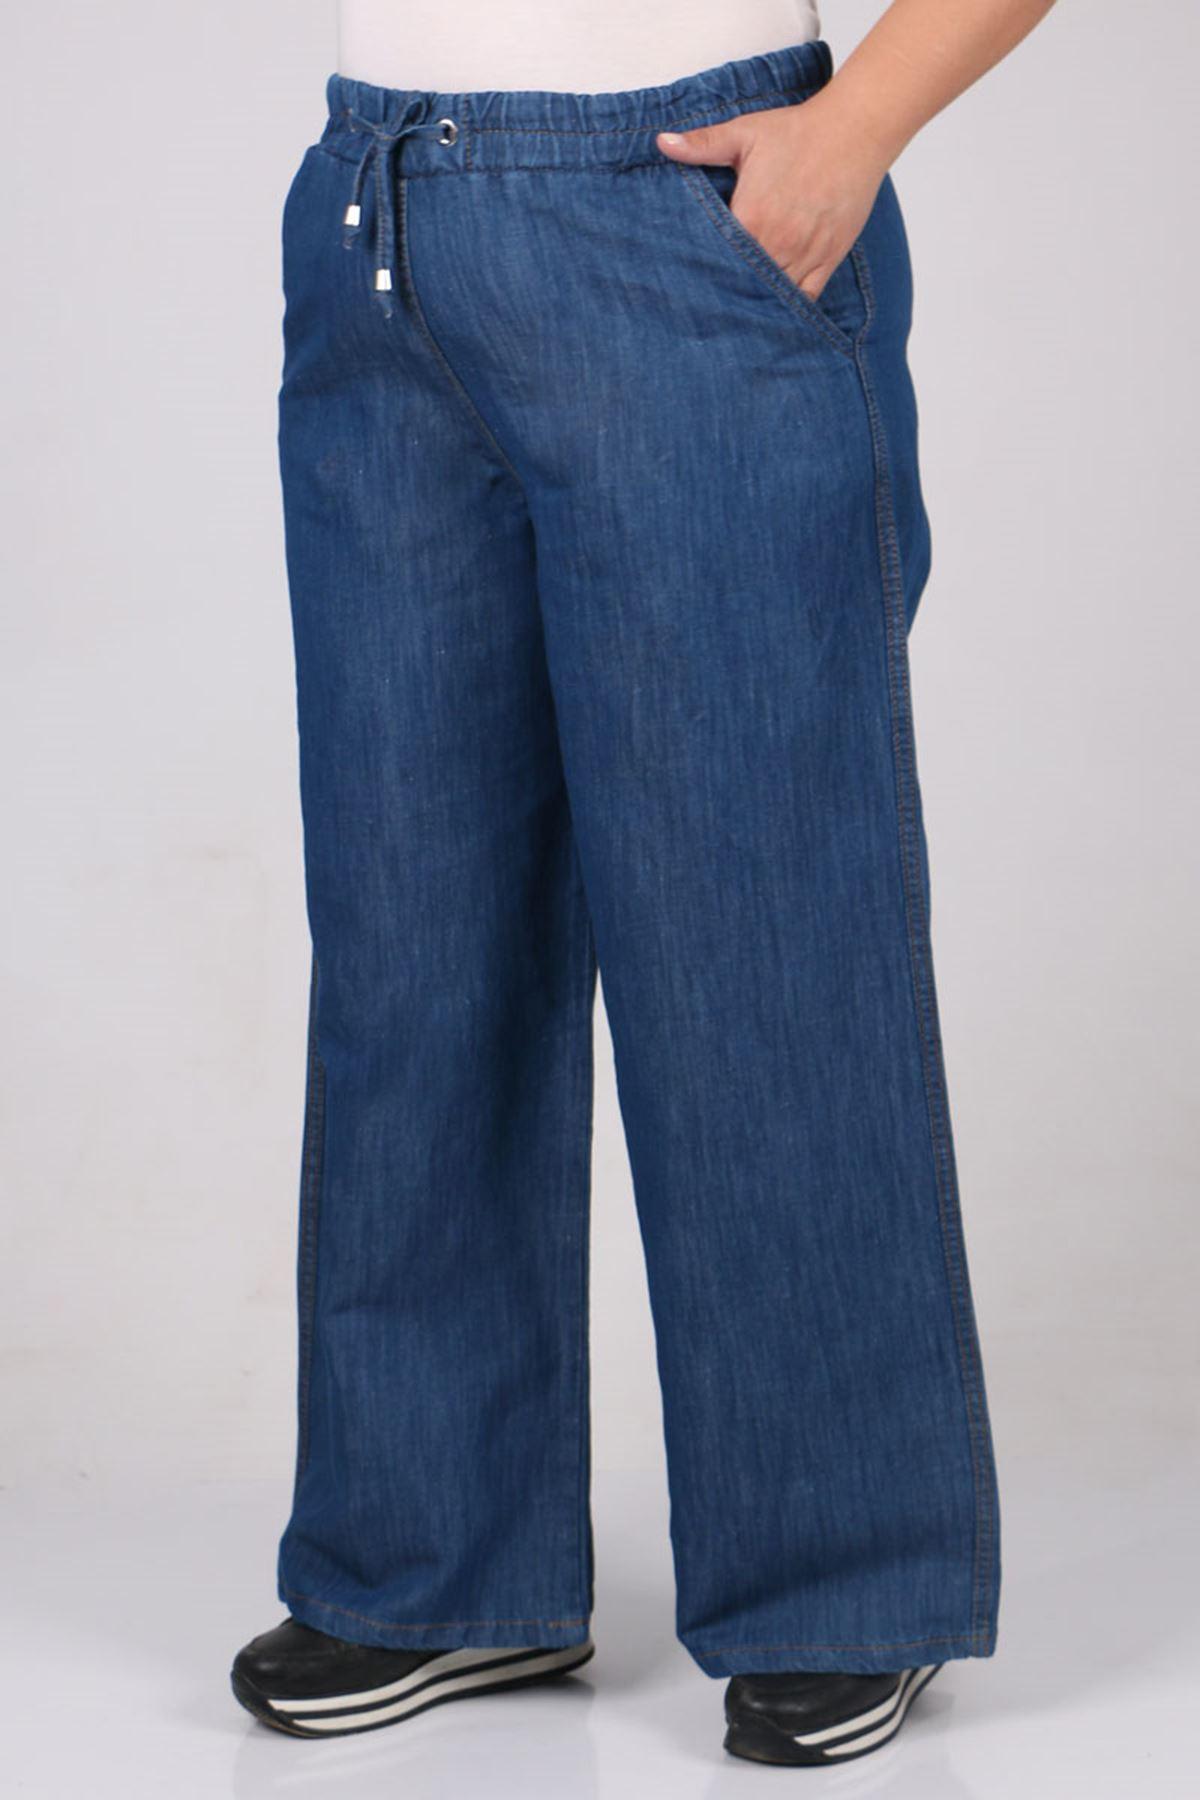 9174 Büyük Beden Bol Paça Kot Pantolon - Mavi